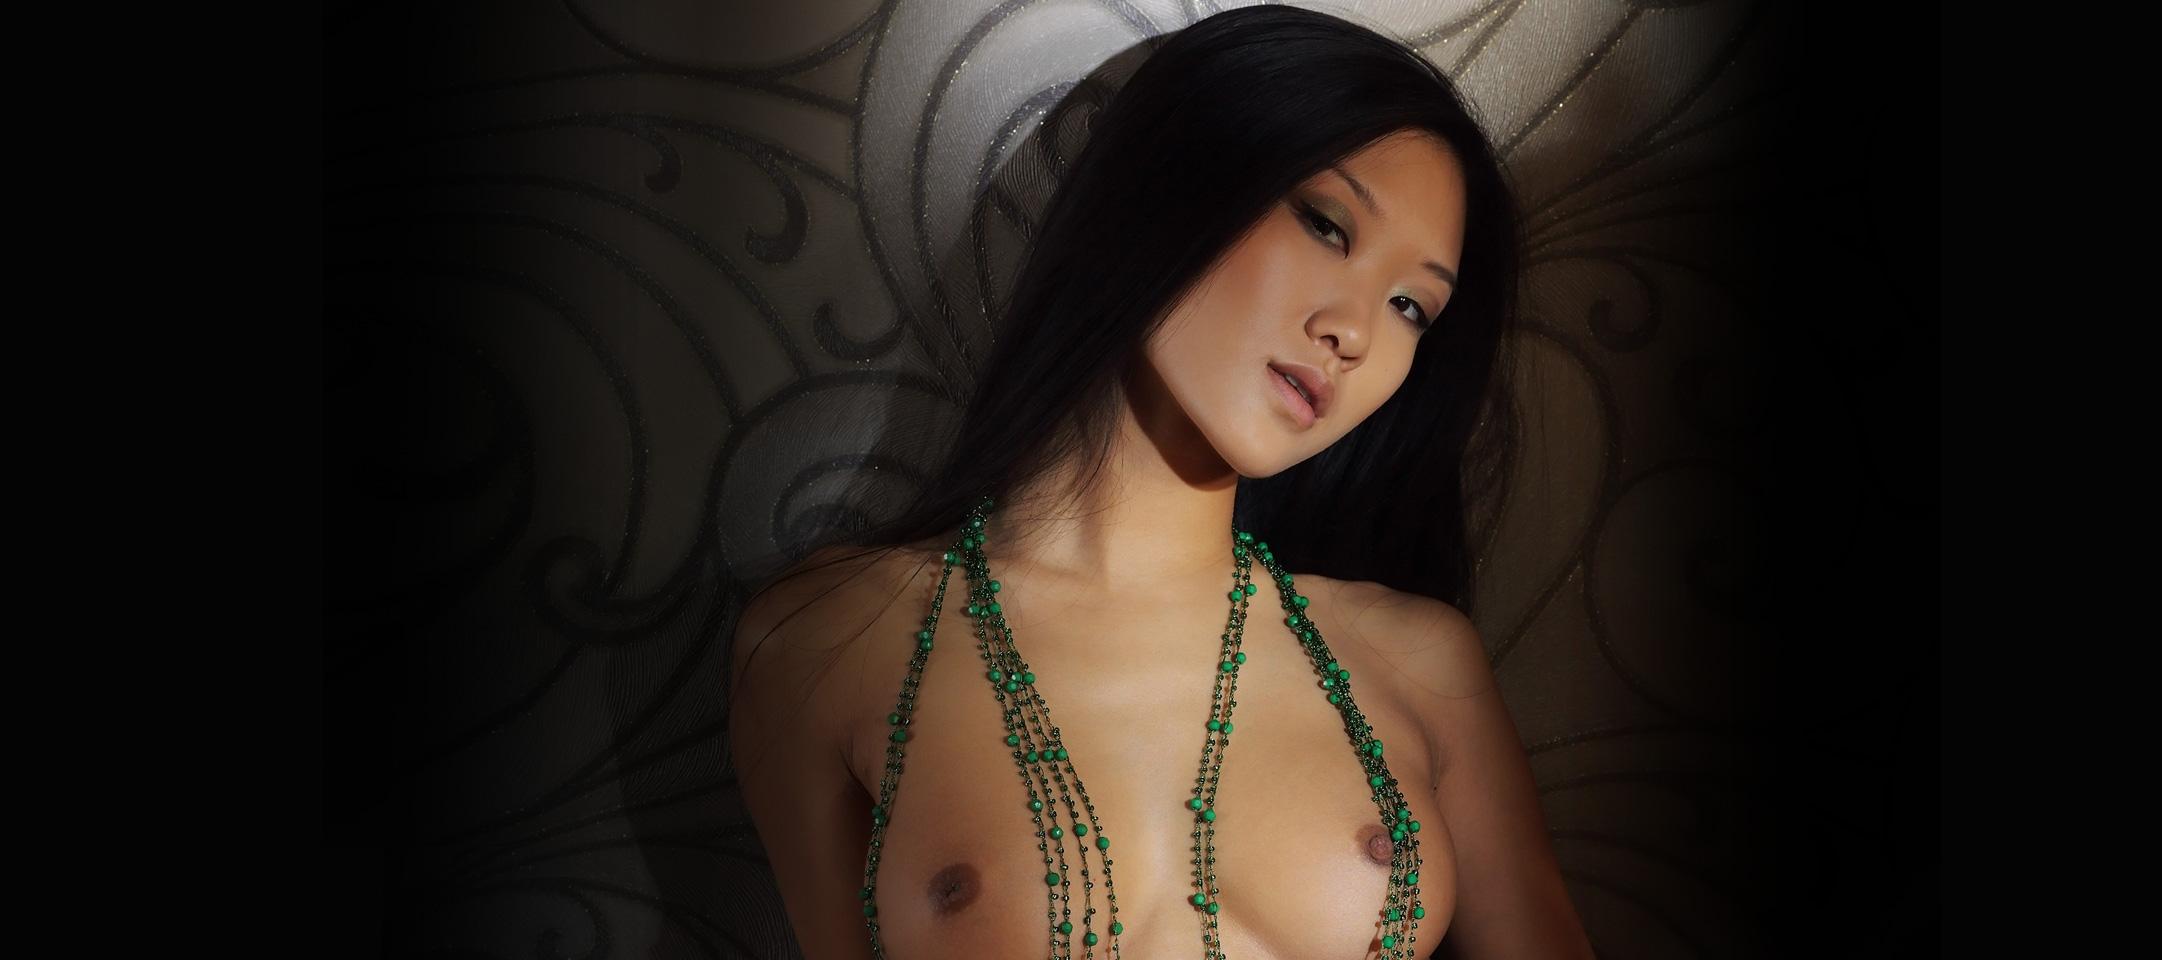 fully naked strippin